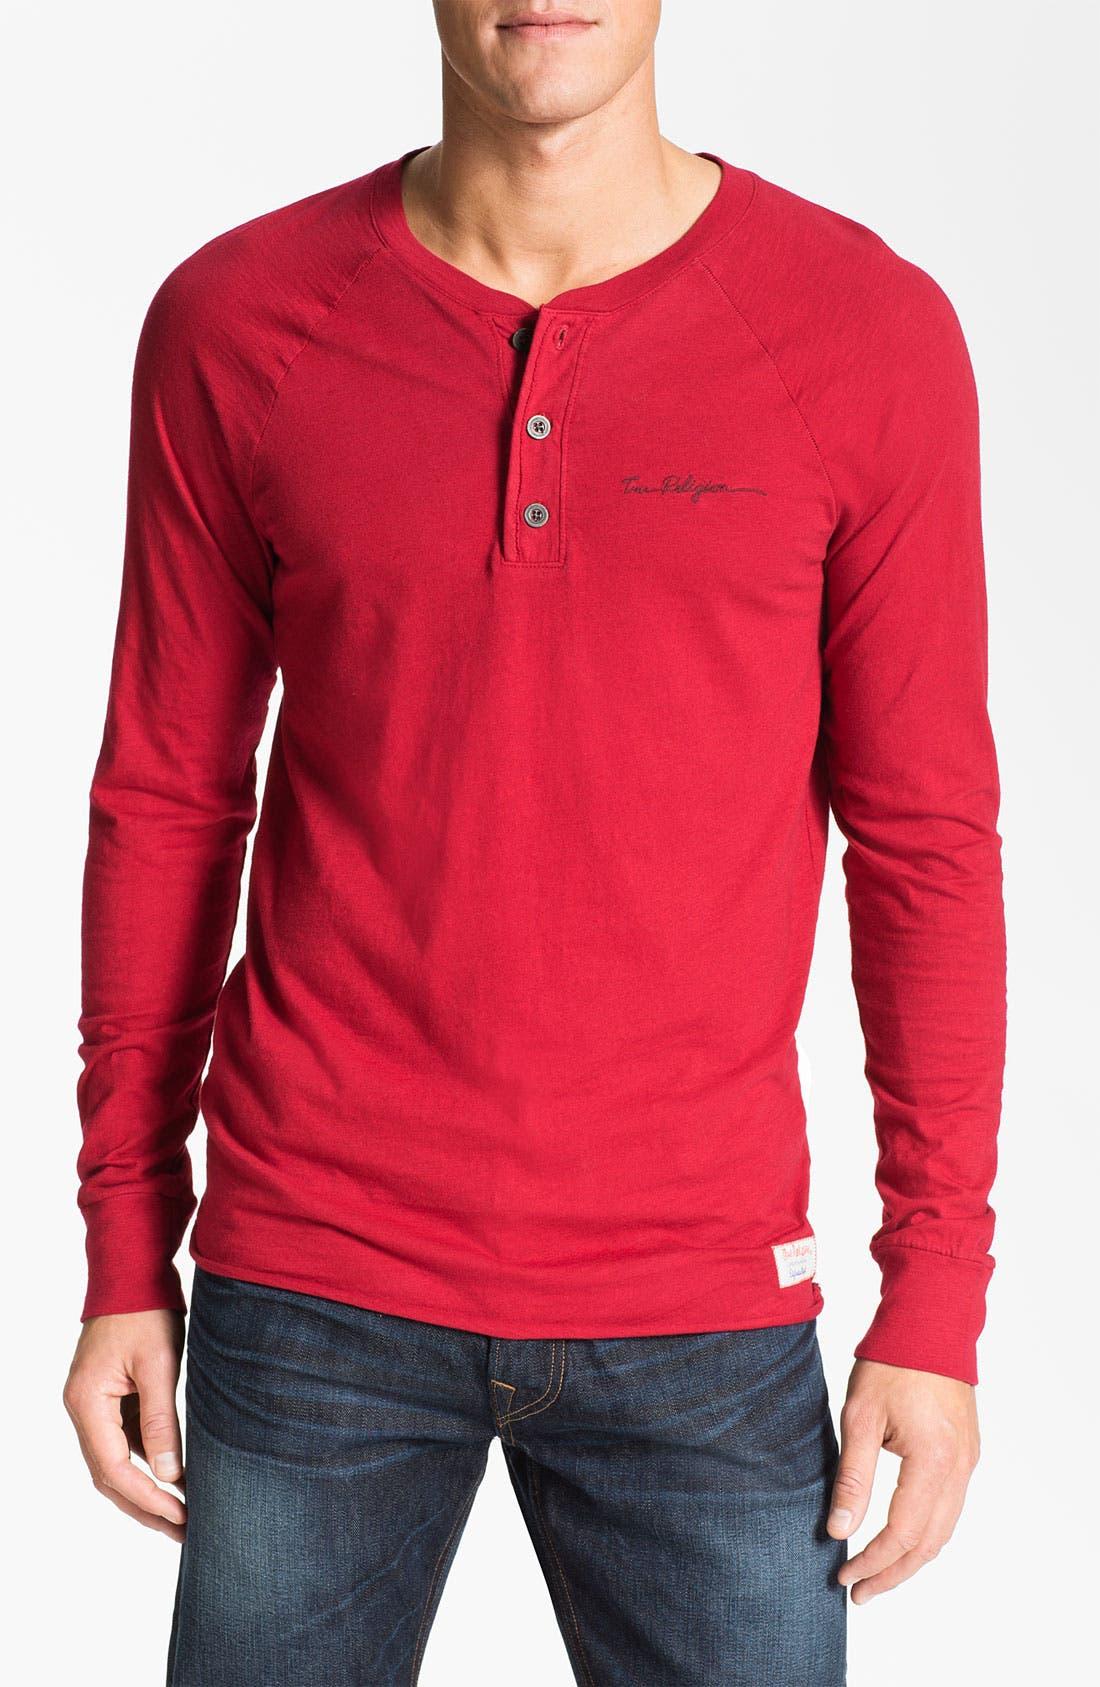 Main Image - True Religion Brand Jeans Slub Jersey Henley